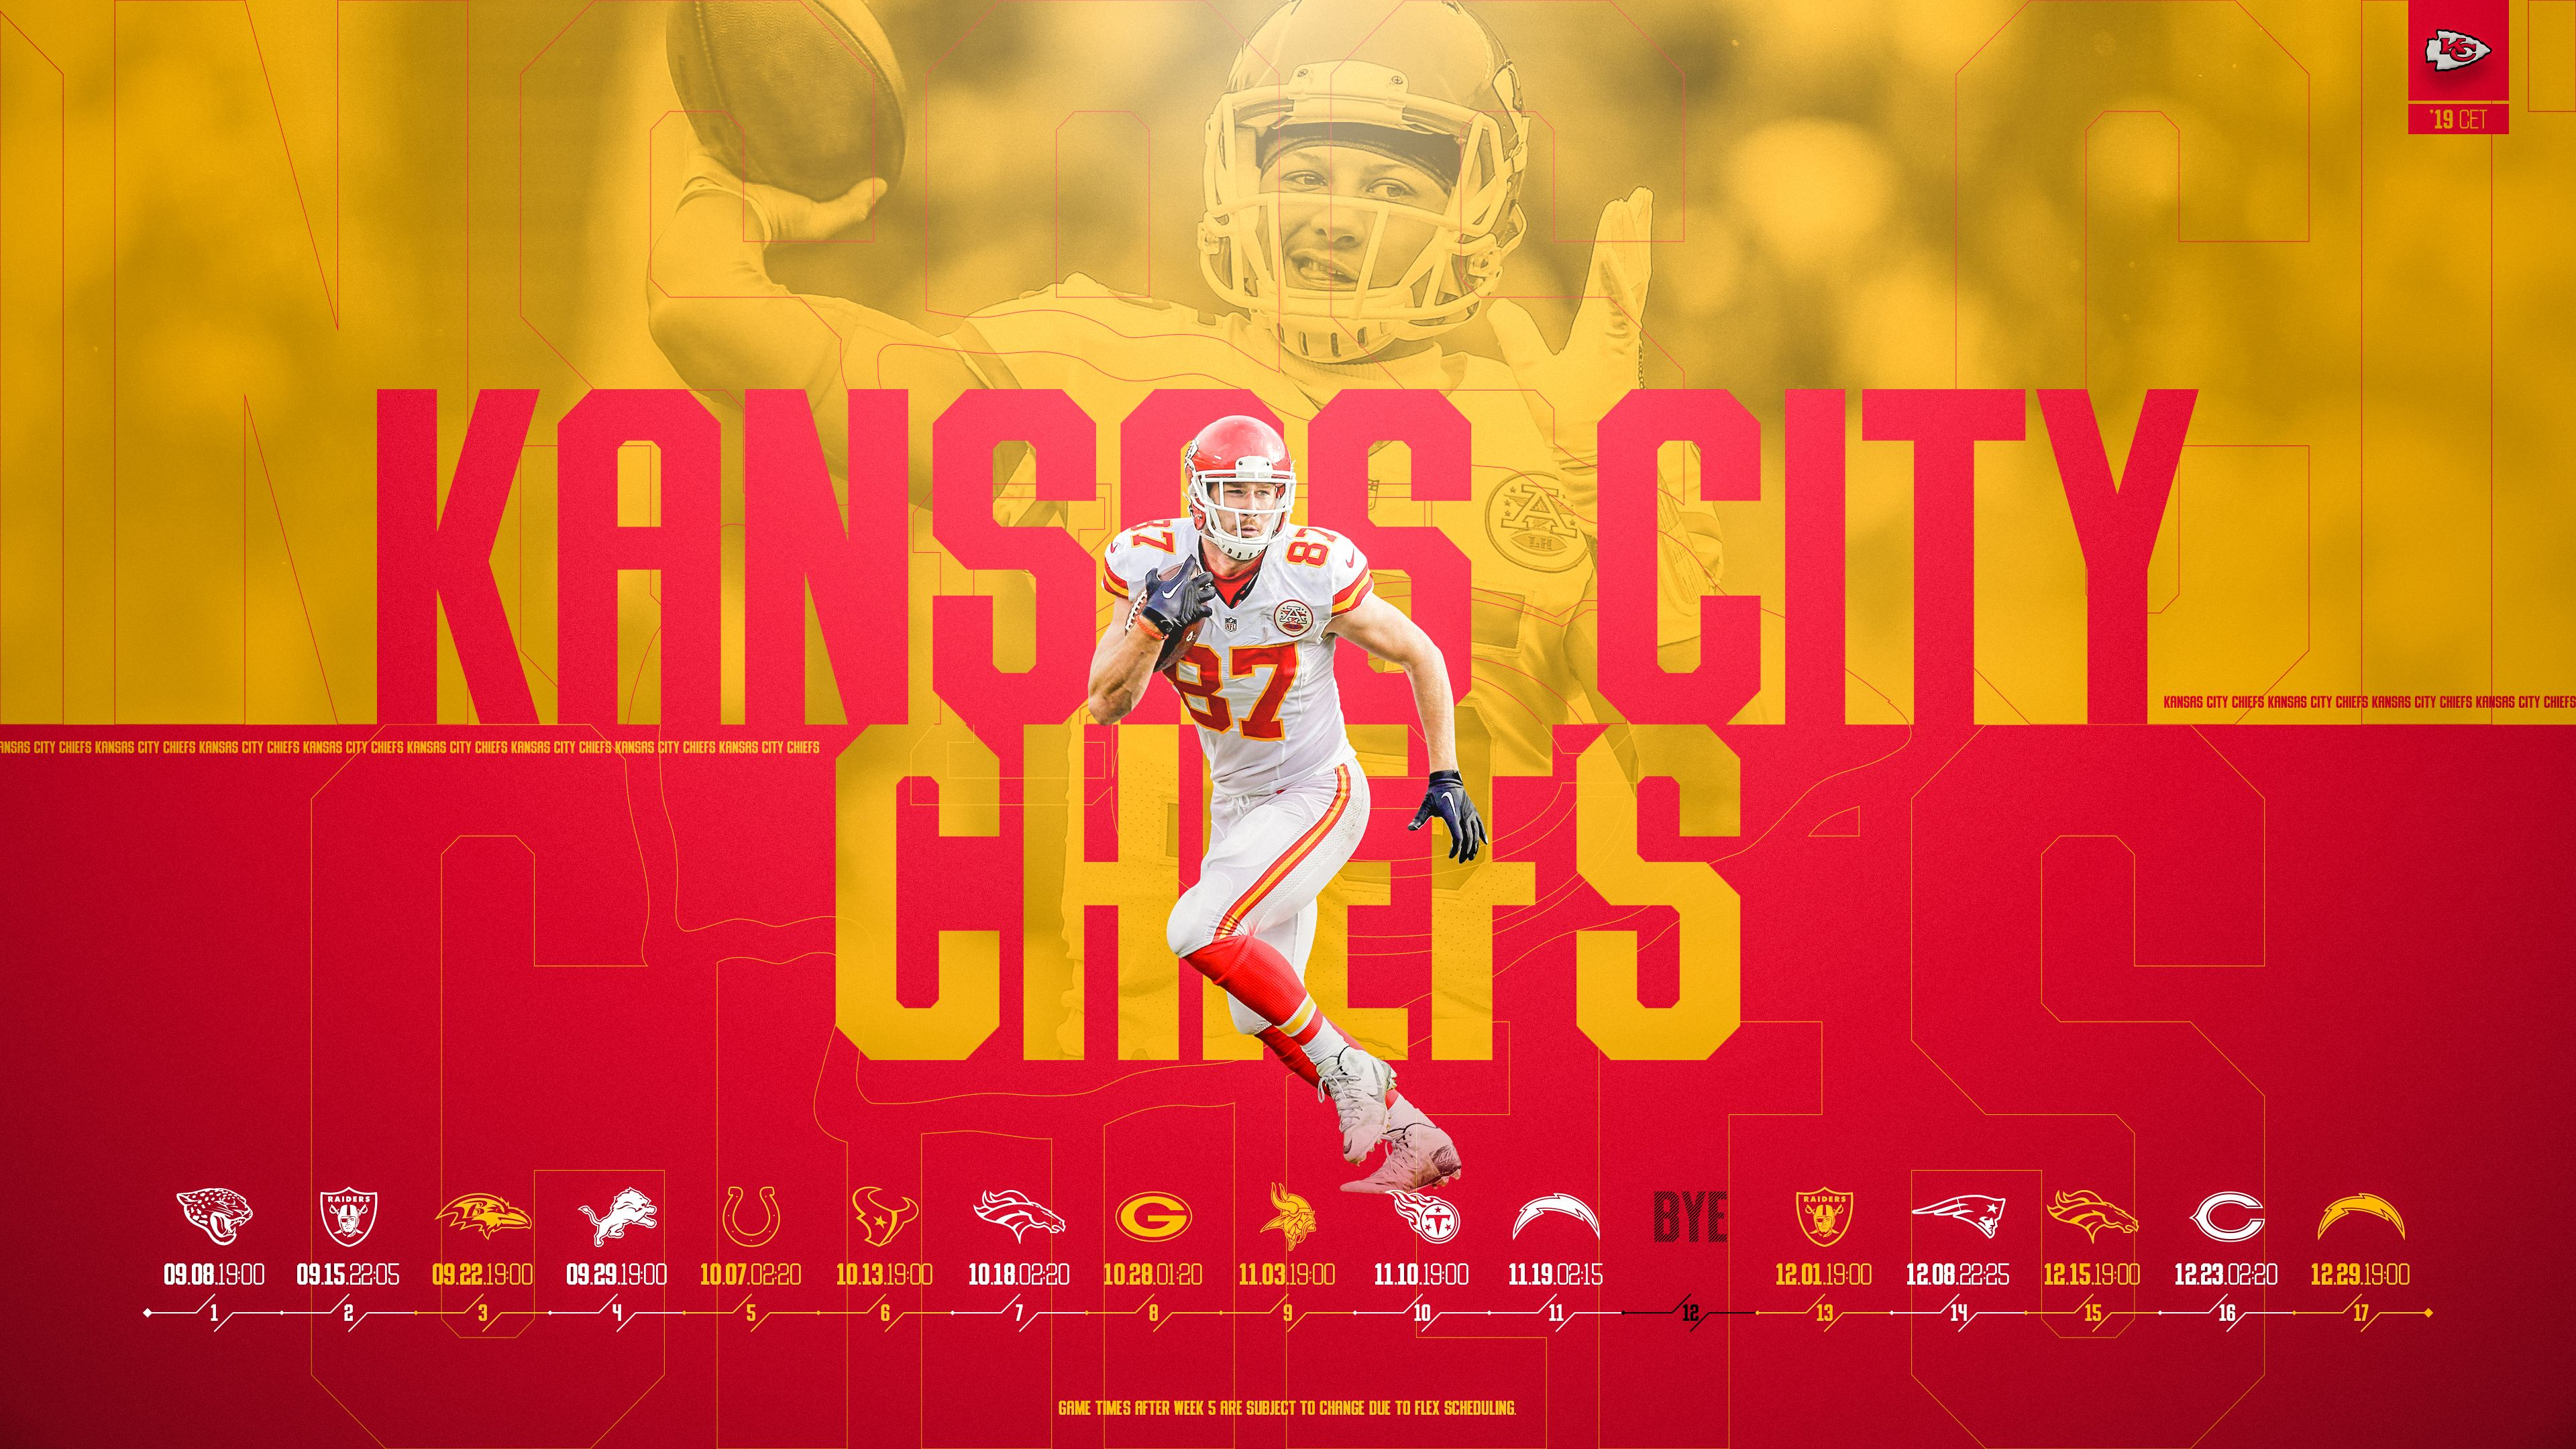 Schedule Wallpaper For The Kansas City Chiefs Regular Season 2019 Central European Time Made By Tobler Gergo Tgersdiy